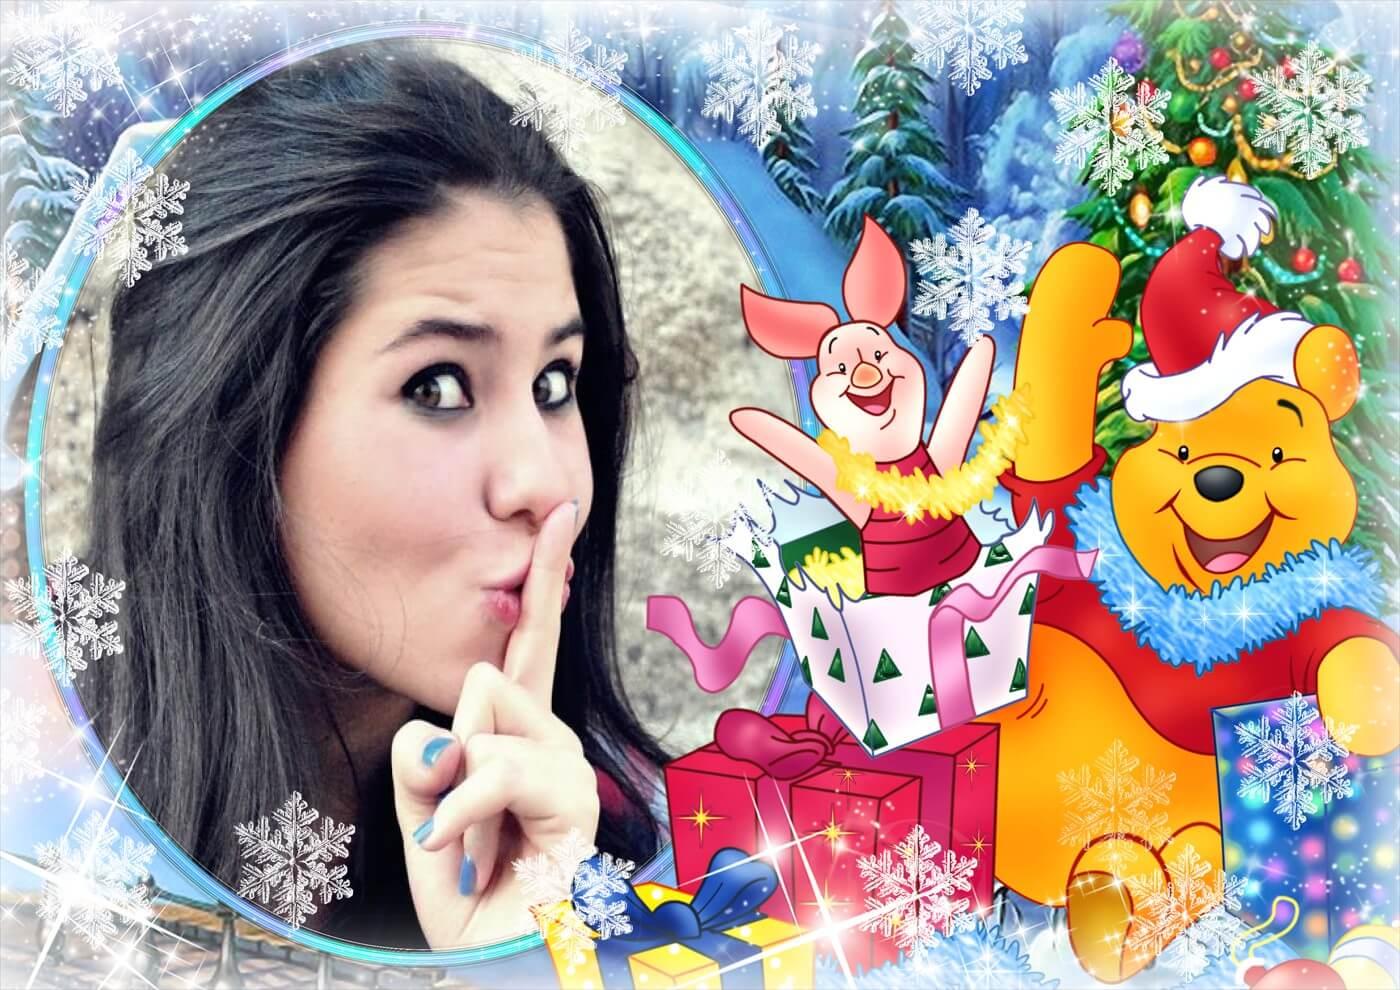 moldura-para-foto-de-winnie-the-pooh-no-natal